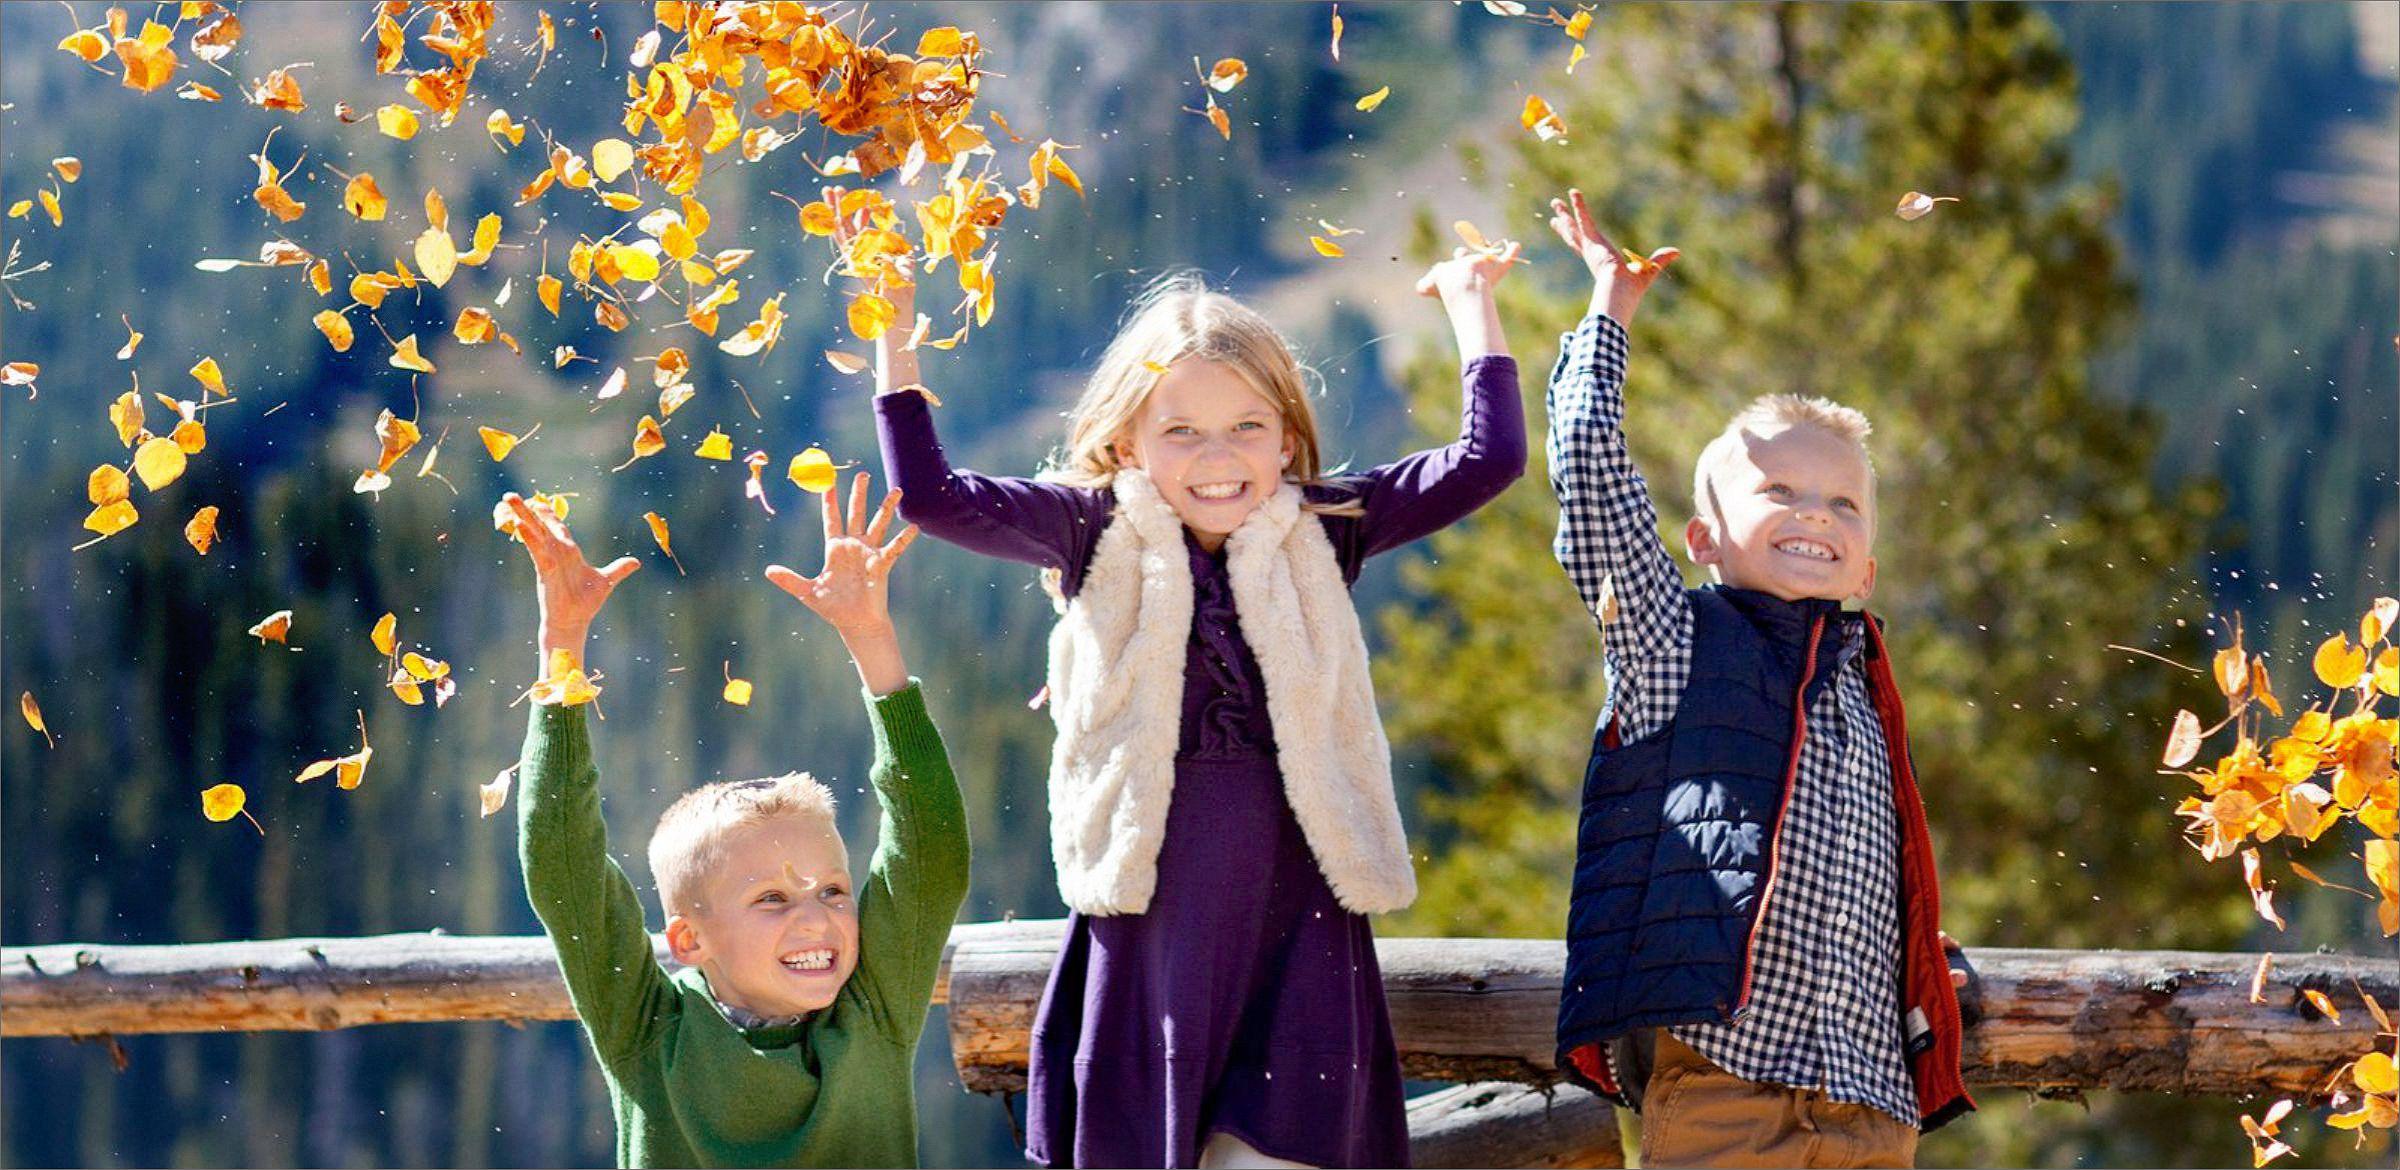 Winter Park Children's Photographer